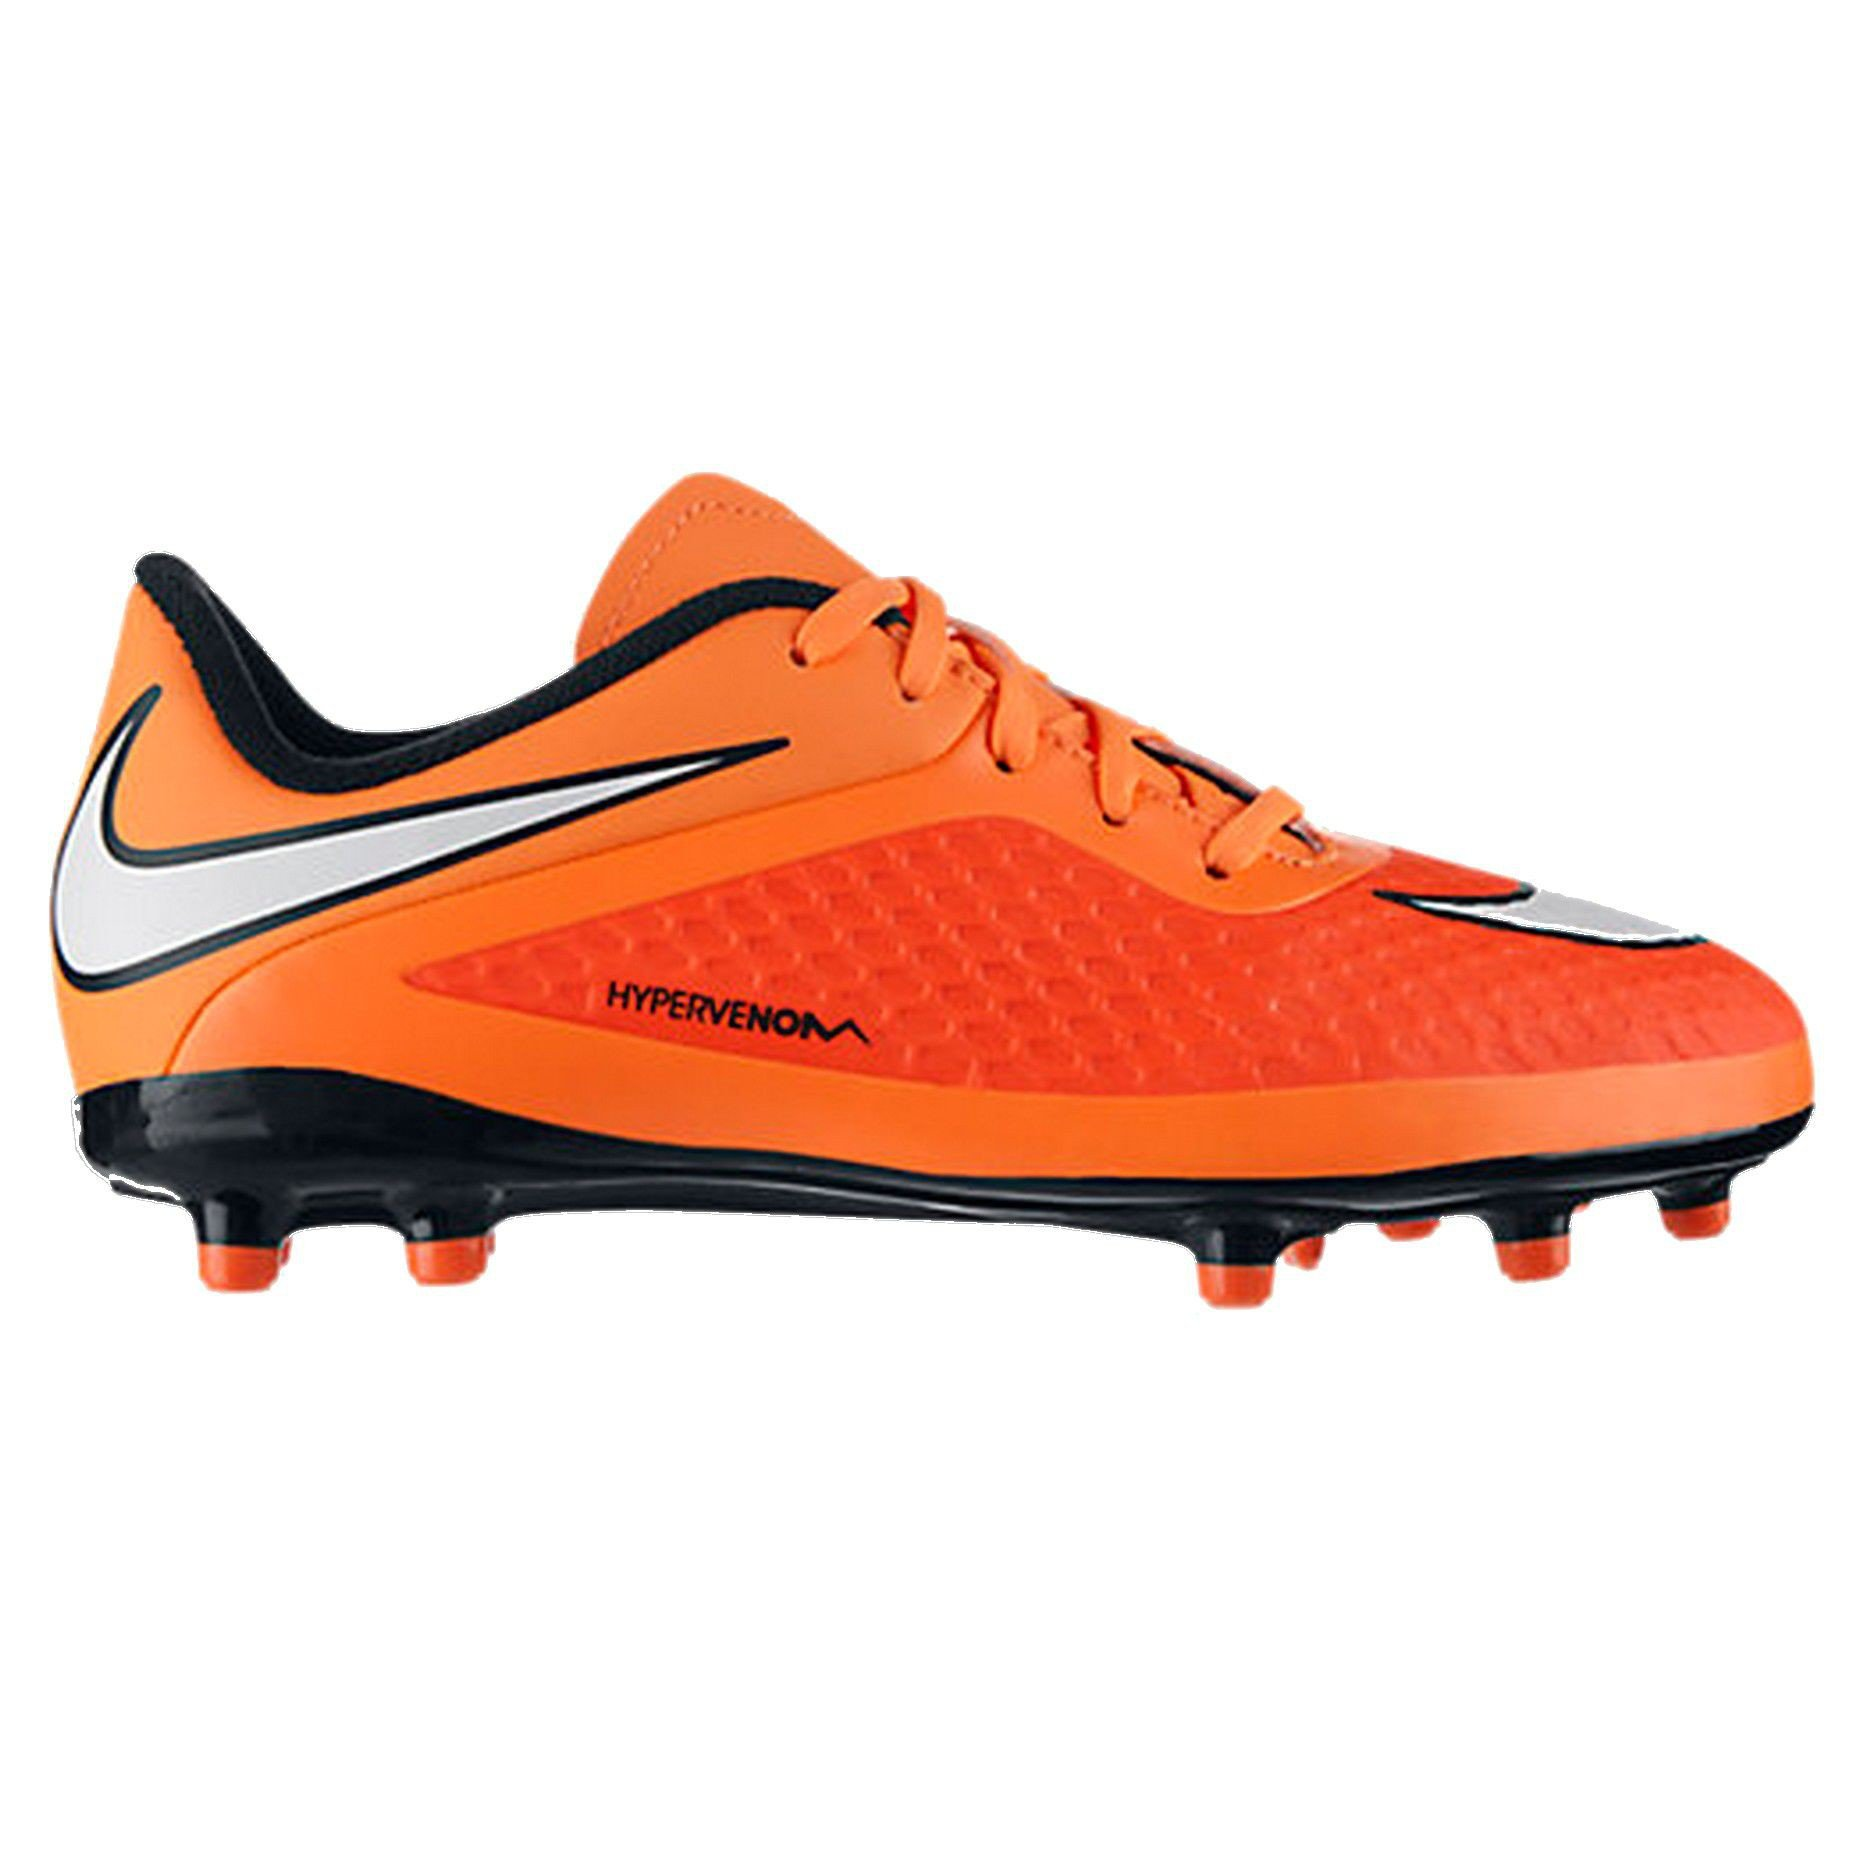 Dzieciece Buty Pilkarskie Nike Hypervenom Phelon Fg 599062 800 I Sklep Pilkarski Sporttiw Pl